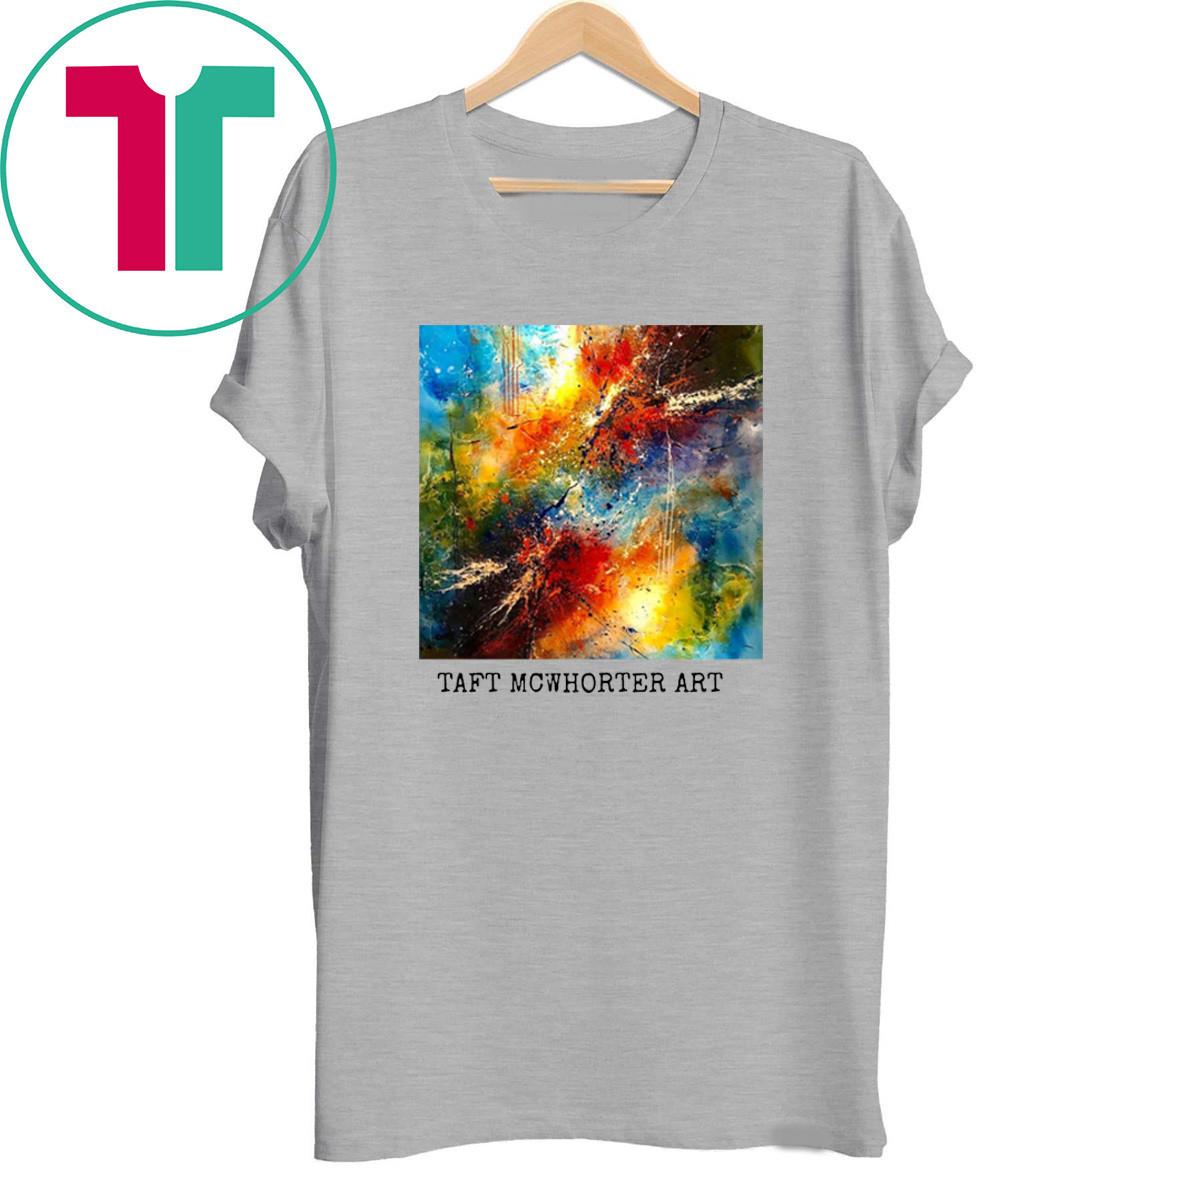 Original Art by Taft McWhorter for Artists and Art Lovers Shirt